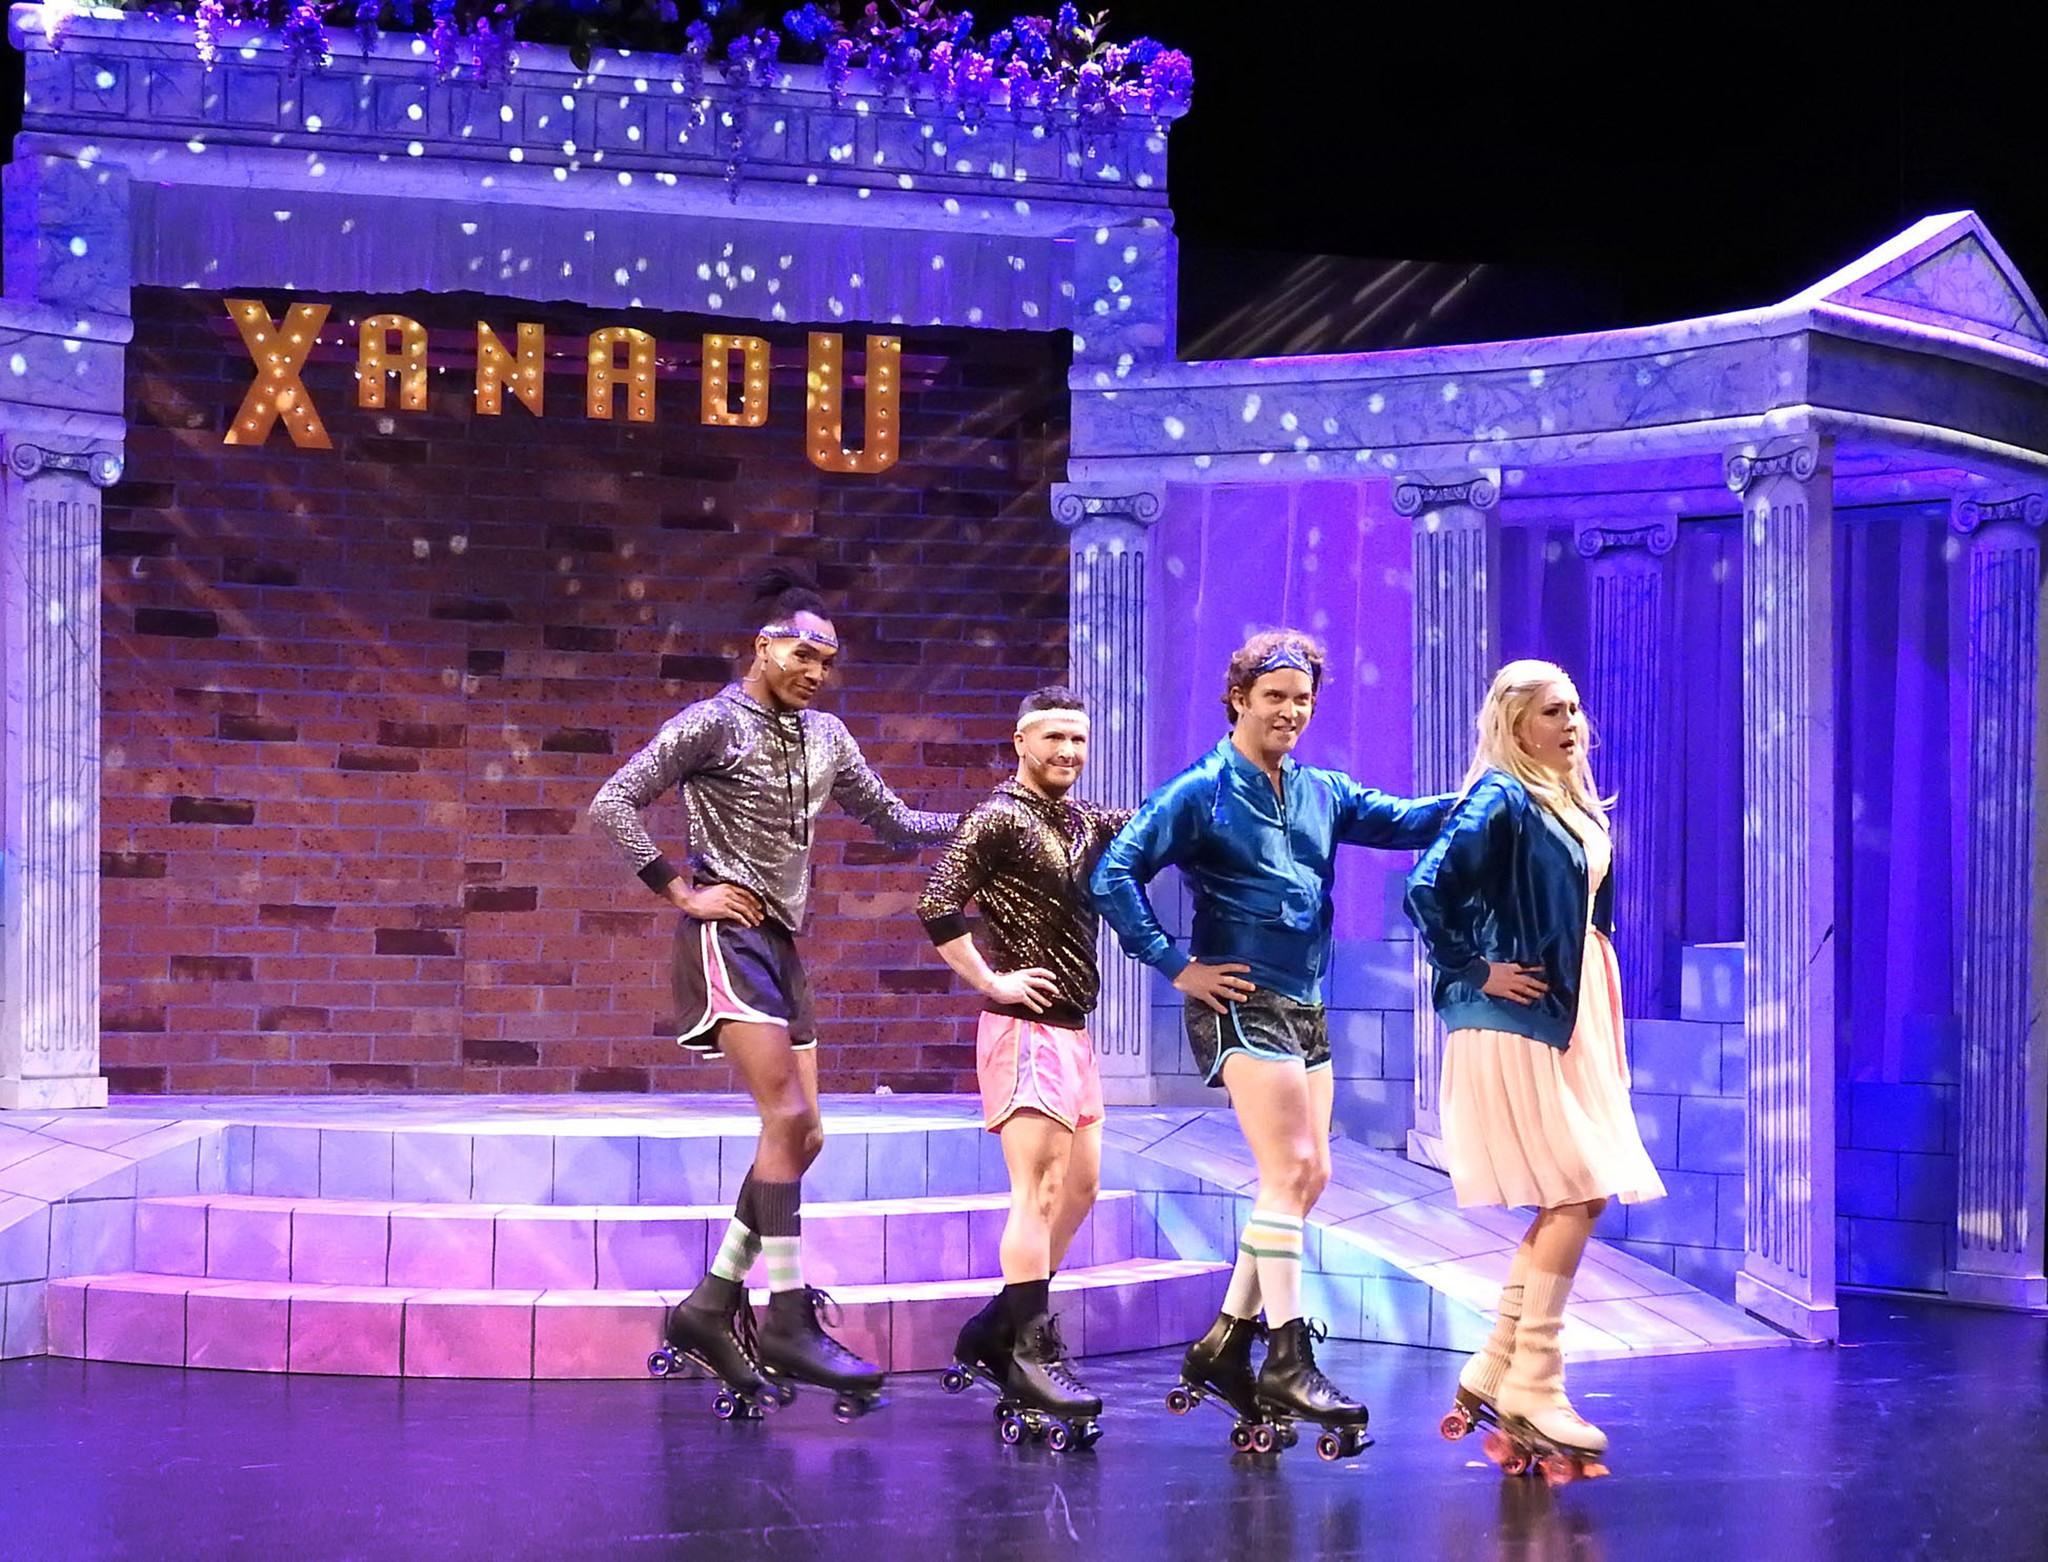 Review Xanadu makes for a great goofy escape